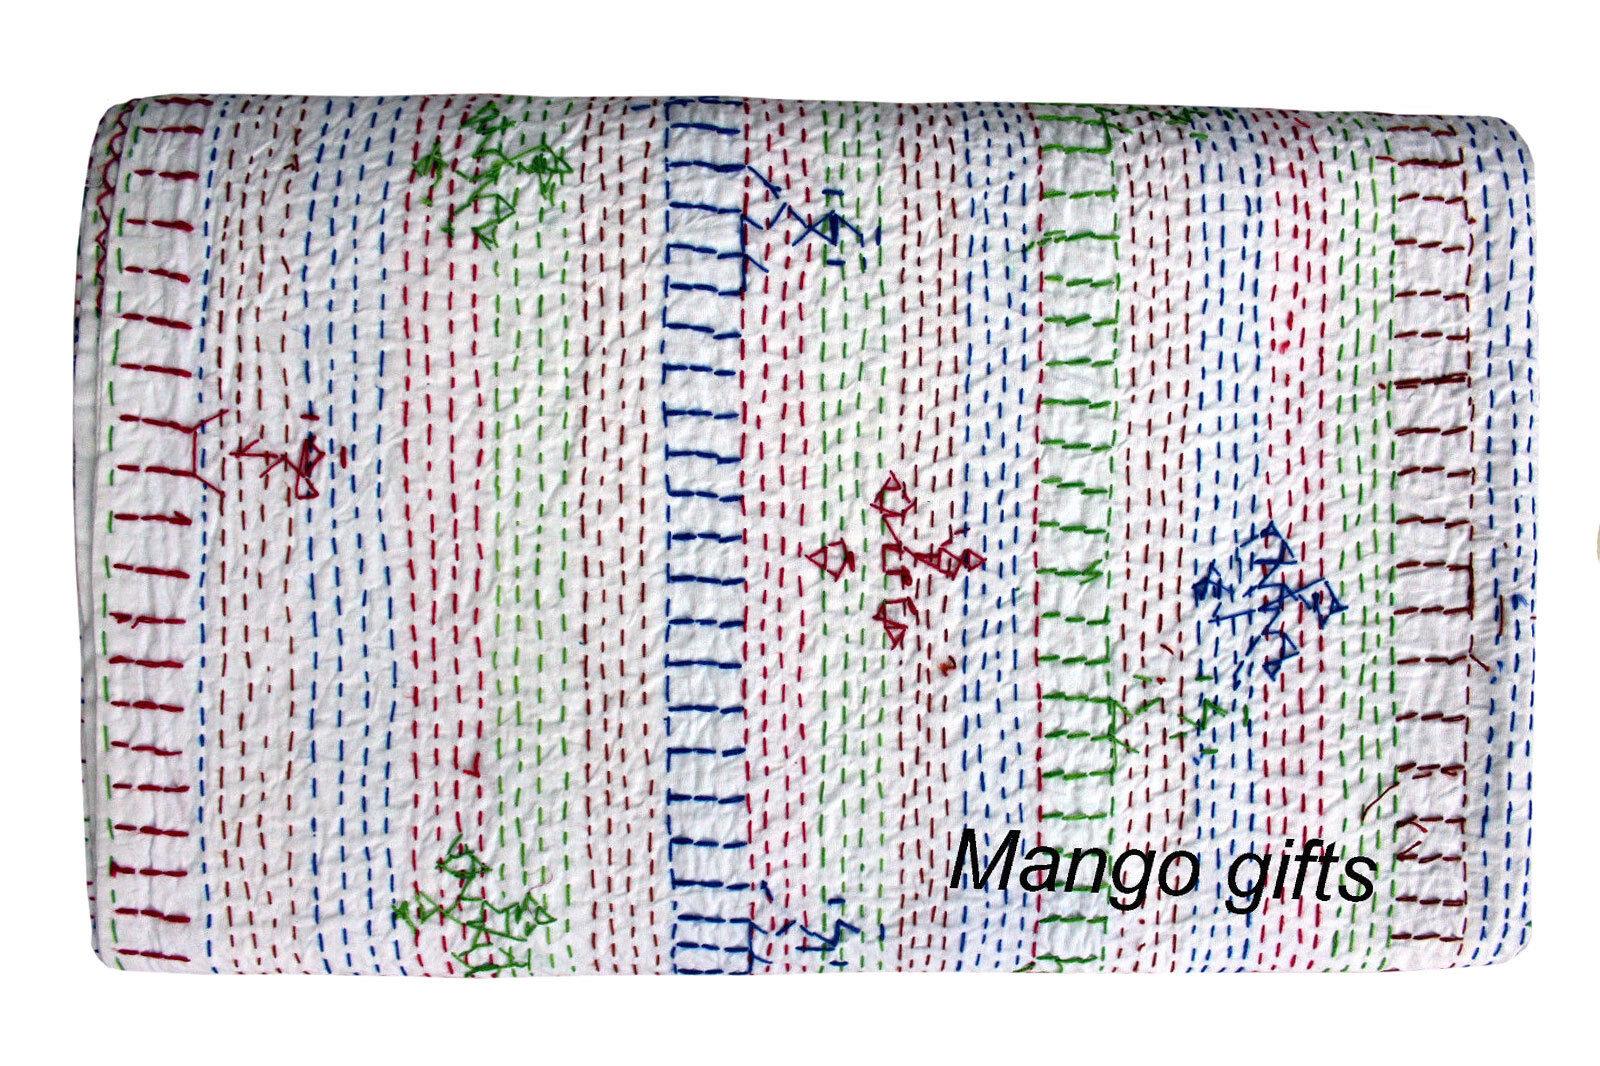 Indian Hand Art Kantha Embroiderosso Ralli Throw Queen Dimensione Cotton Bedspread bianca